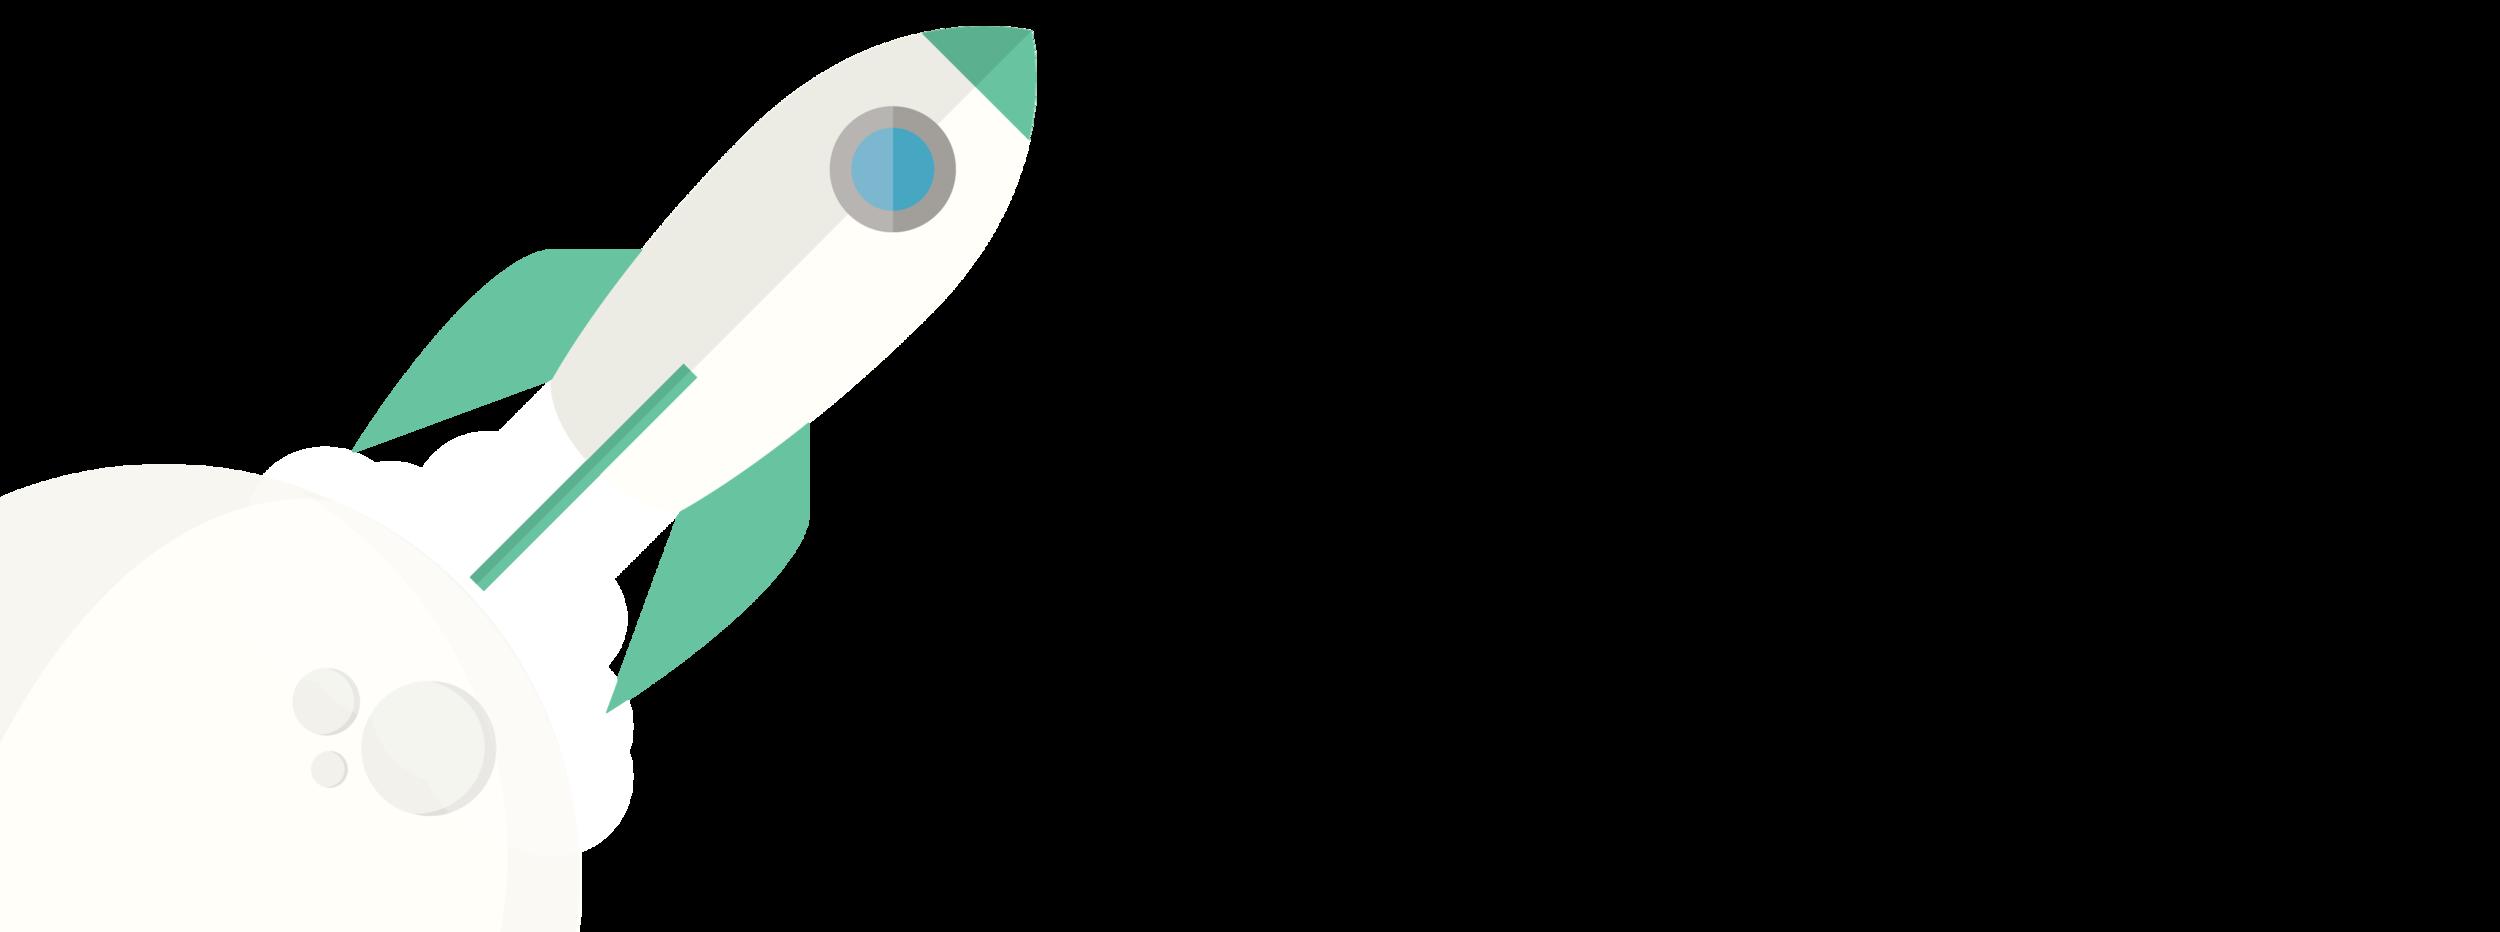 StartupCenter-02.png